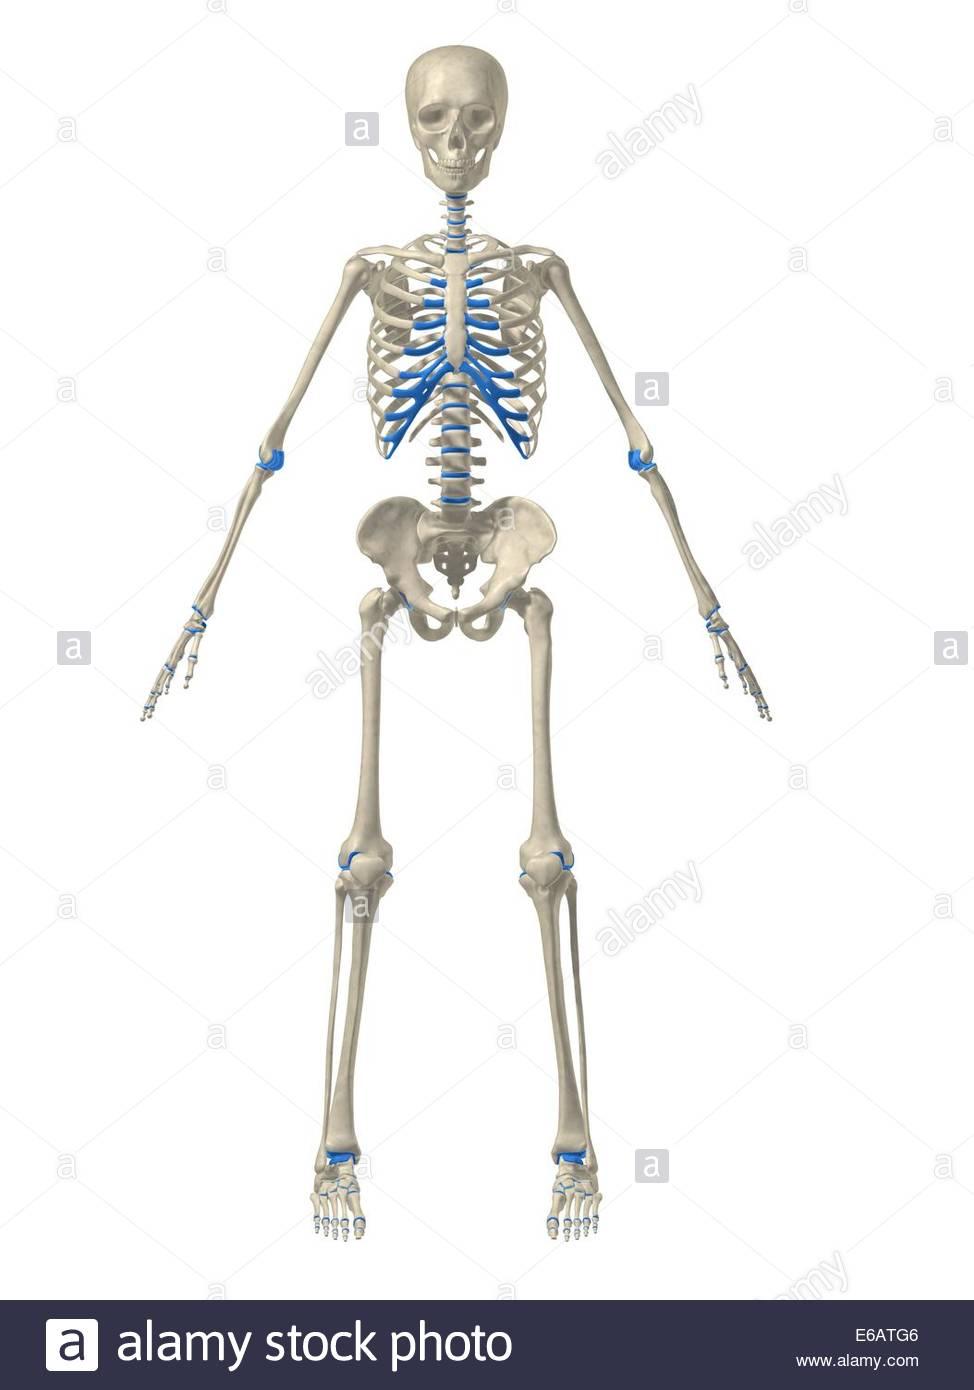 Charmant Hai Skelett Anatomie Bilder - Anatomie Ideen - finotti.info